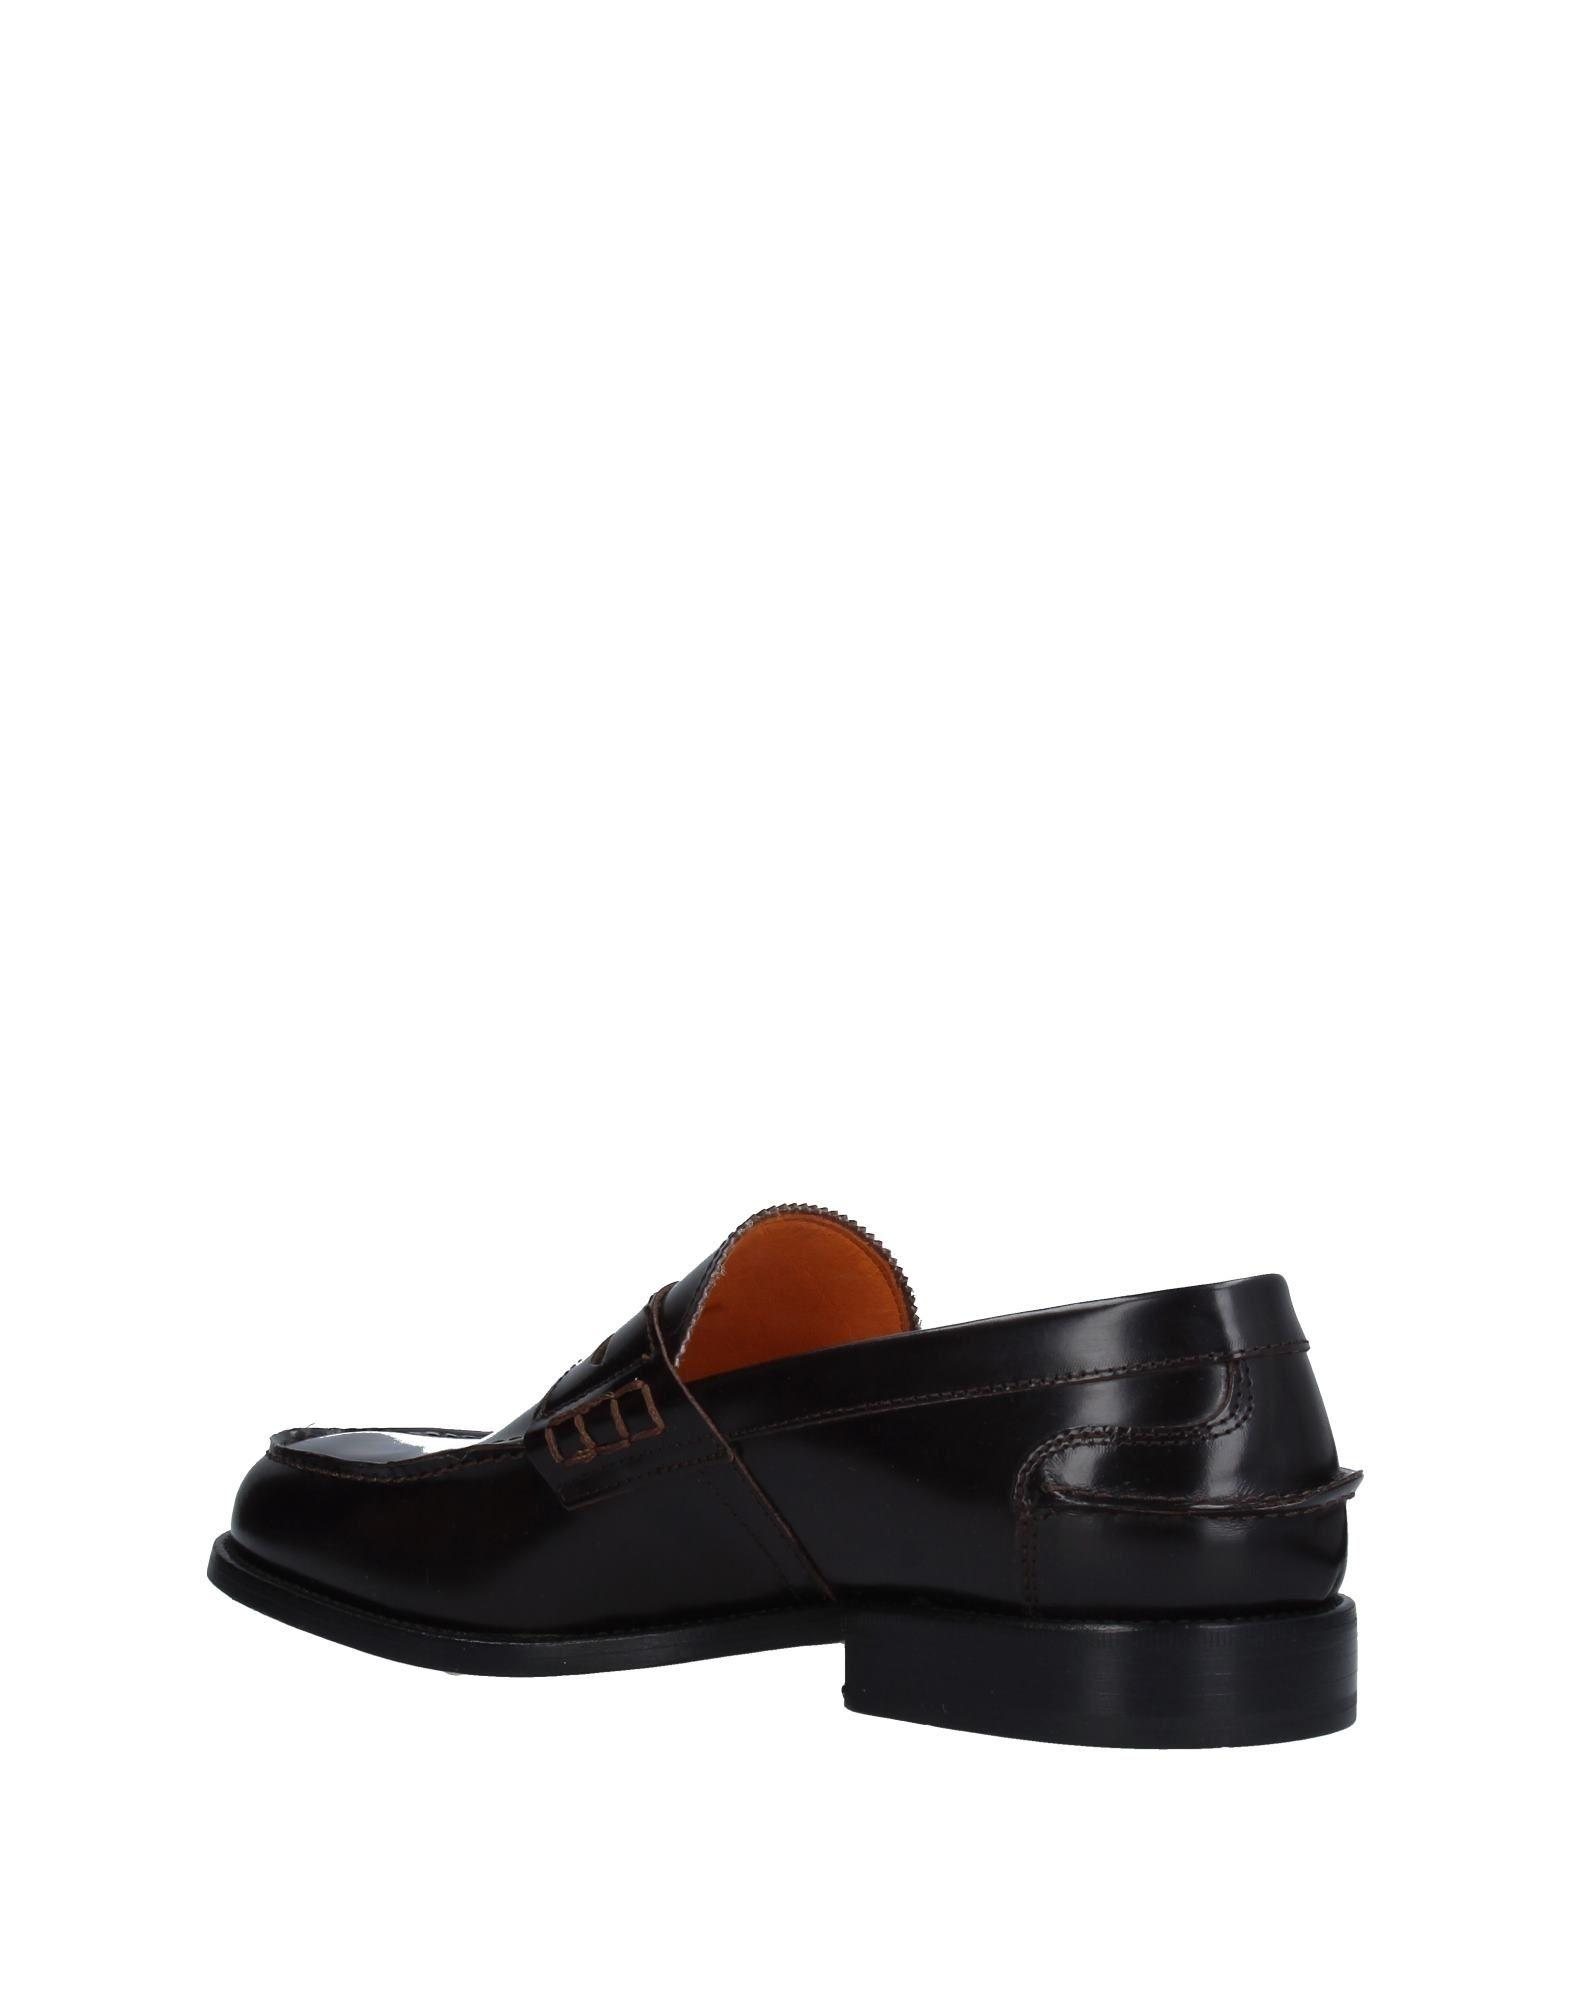 gianfranco lattanzi loafer in brown for men lyst. Black Bedroom Furniture Sets. Home Design Ideas